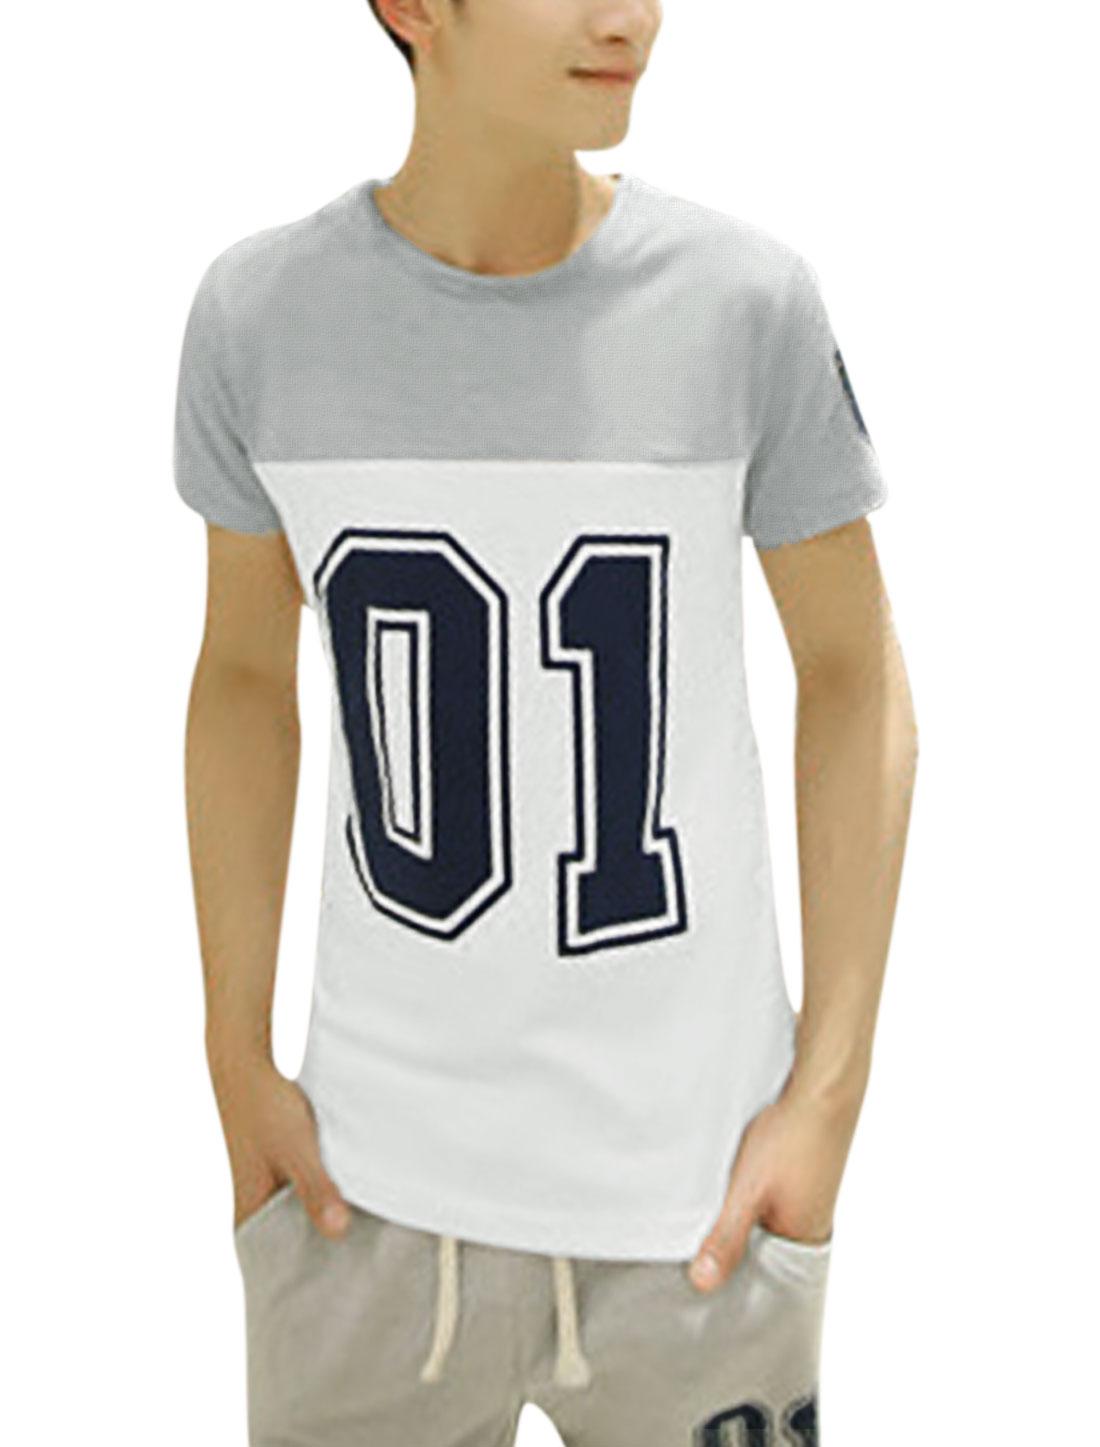 Men Short Sleeve Number Prints Panel Design Coloblock T-Shirt Gray White M